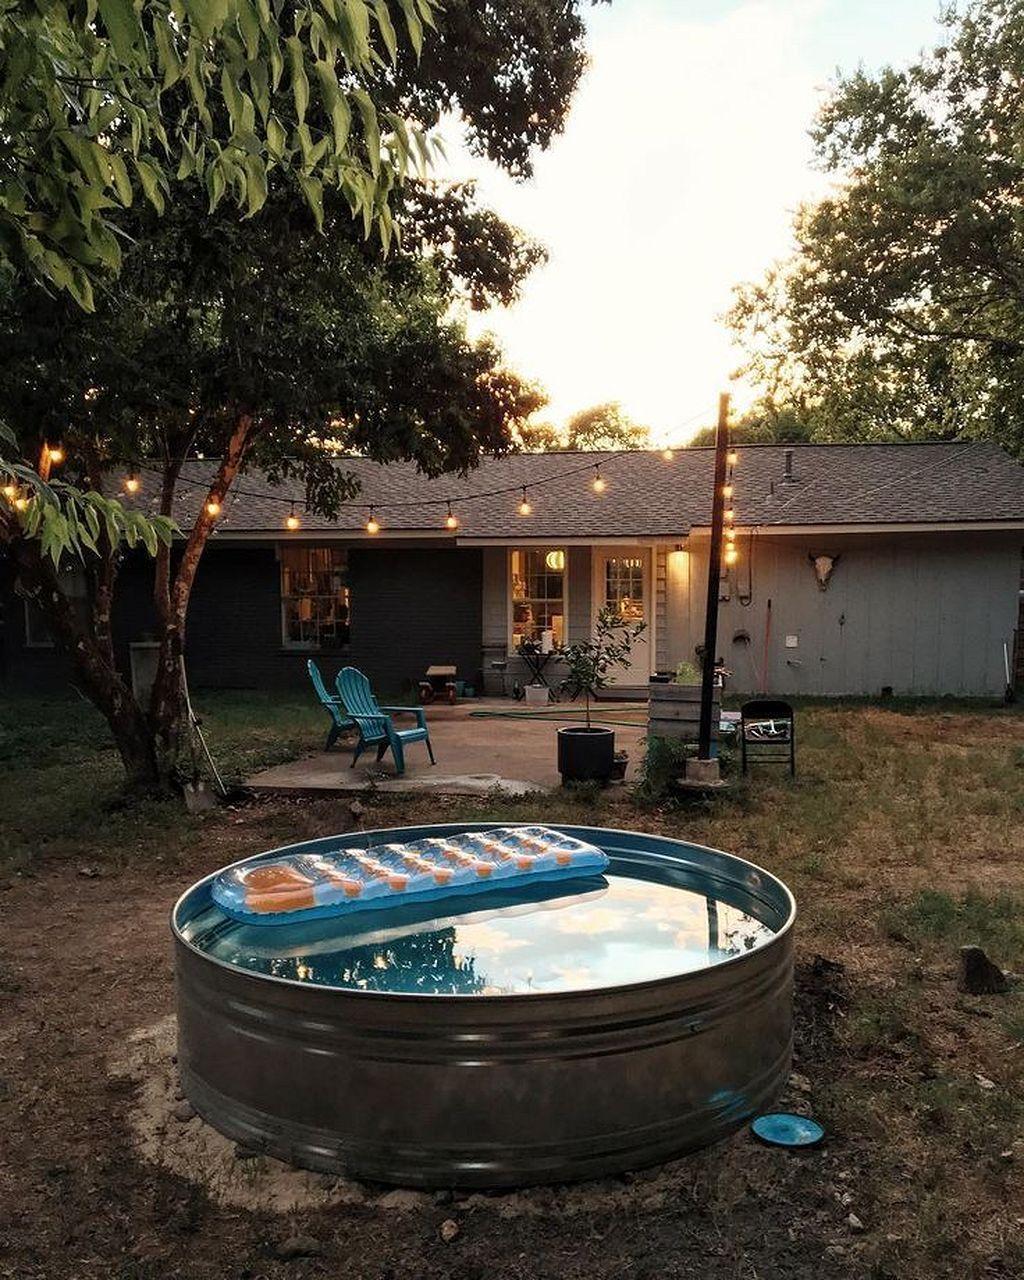 Diy Galvanized Stock Tank Pool To Beat The Summer Heat Ideas4